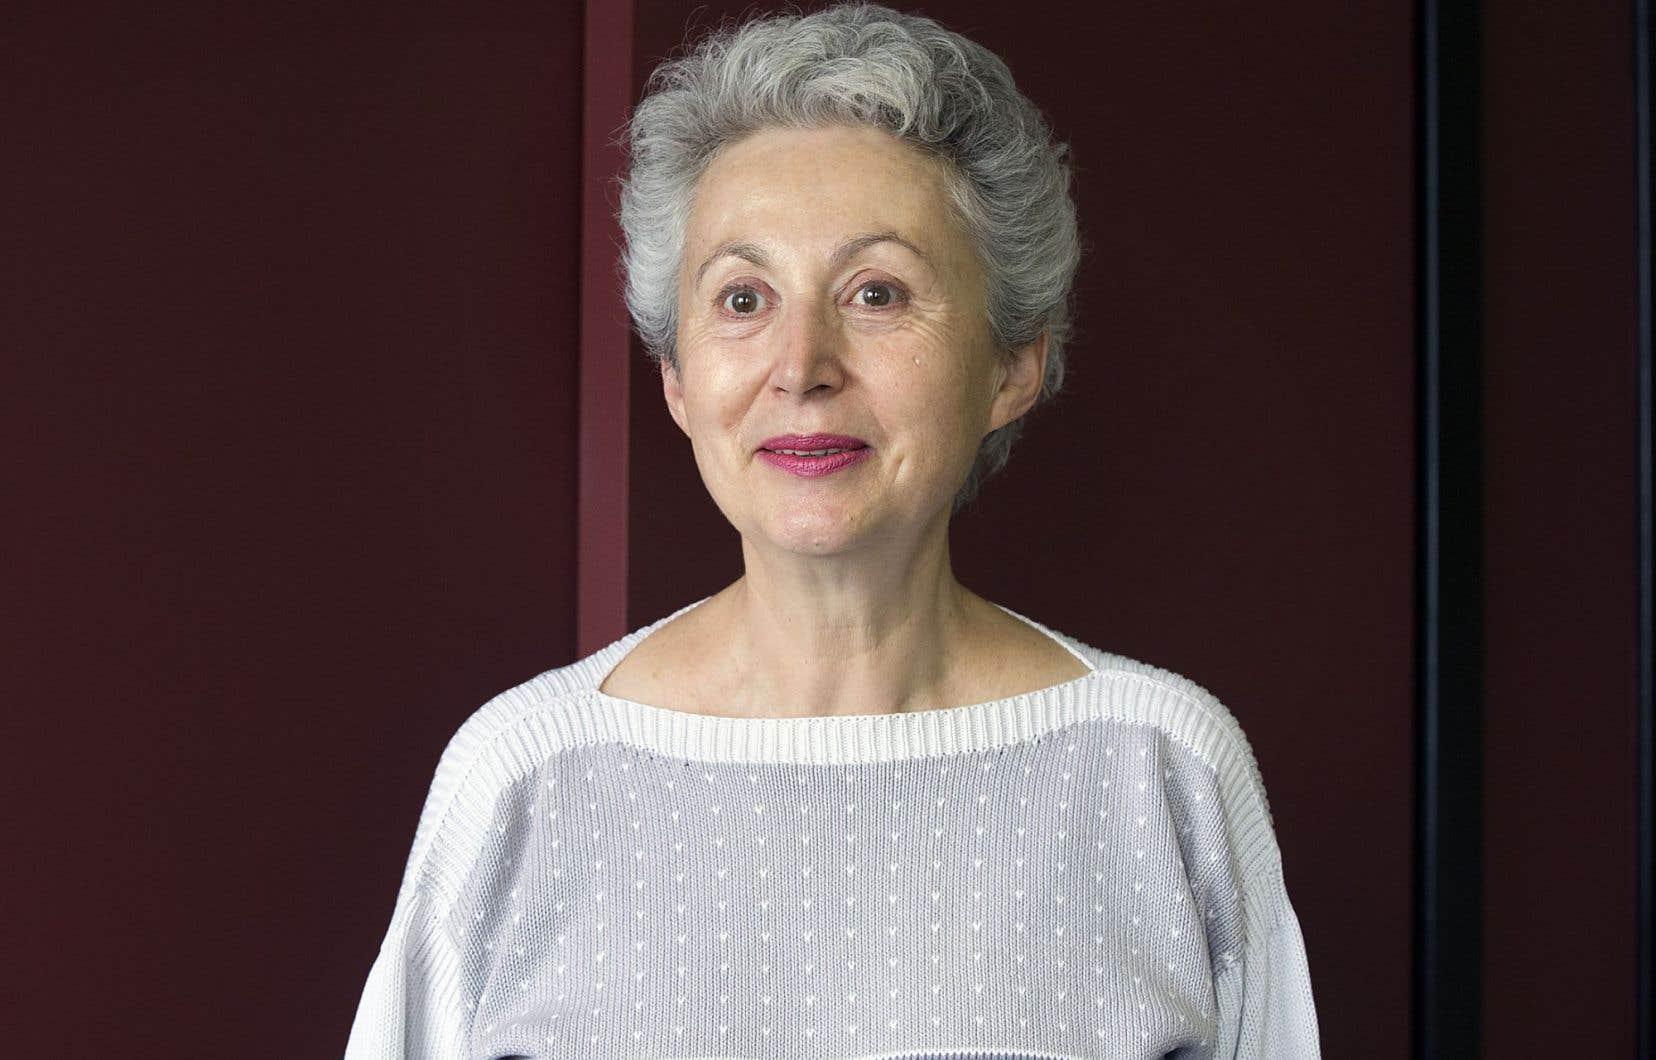 L'historienne féministe Florence Montreynaud